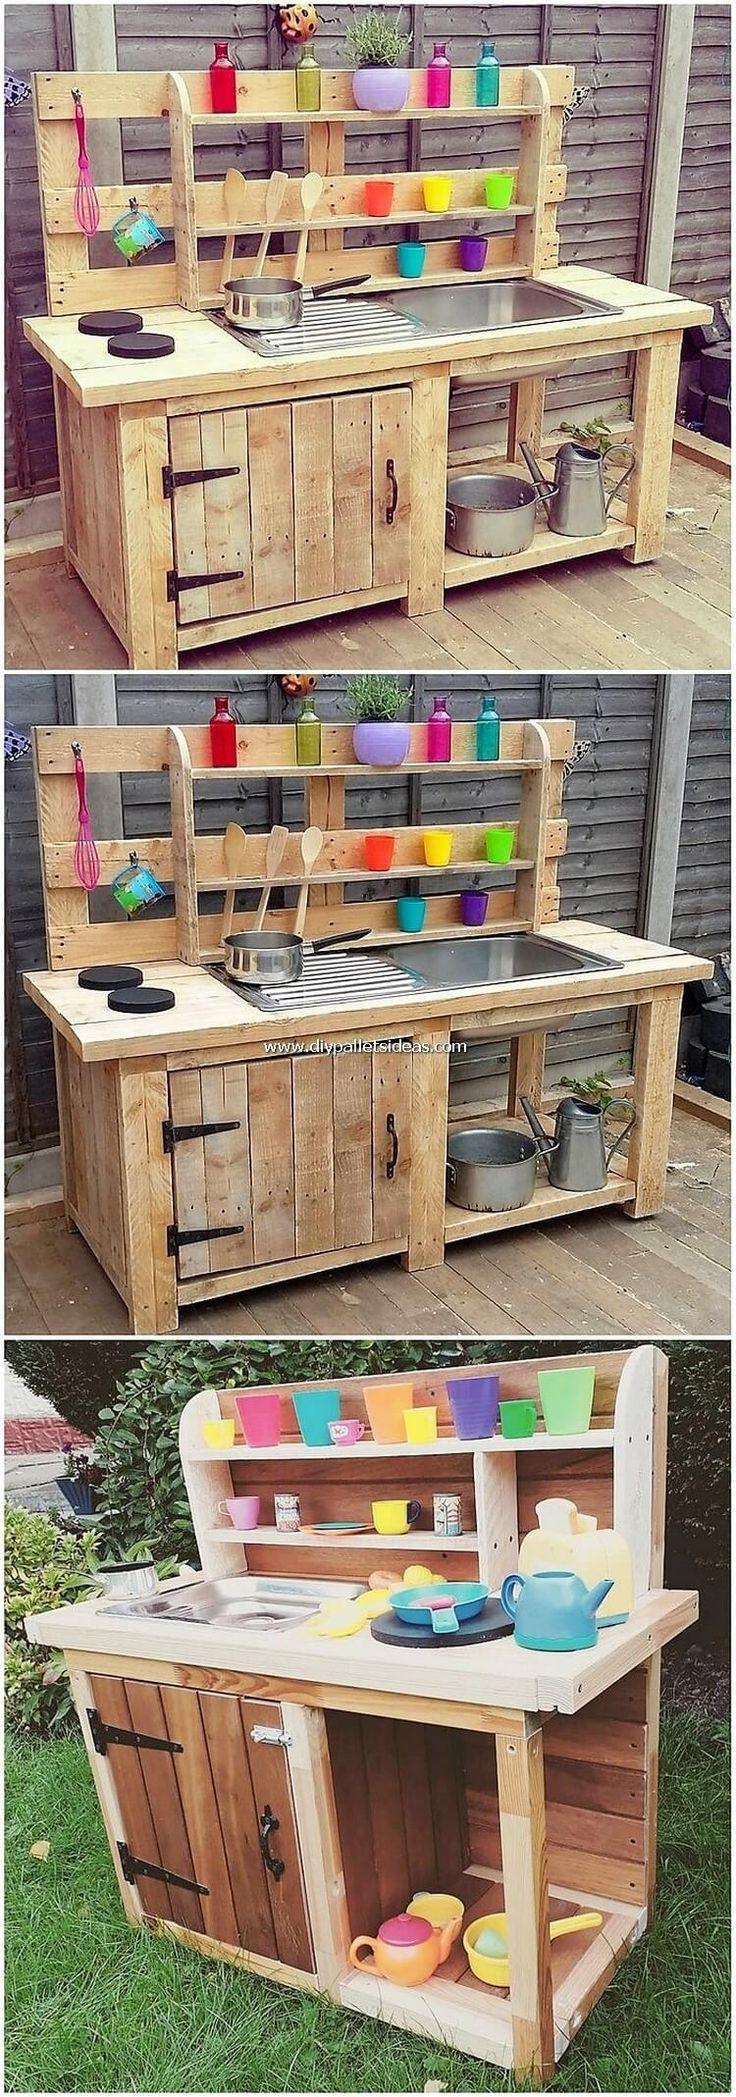 Verblüffende DIY-Paletten-Ideen für Home Beauty